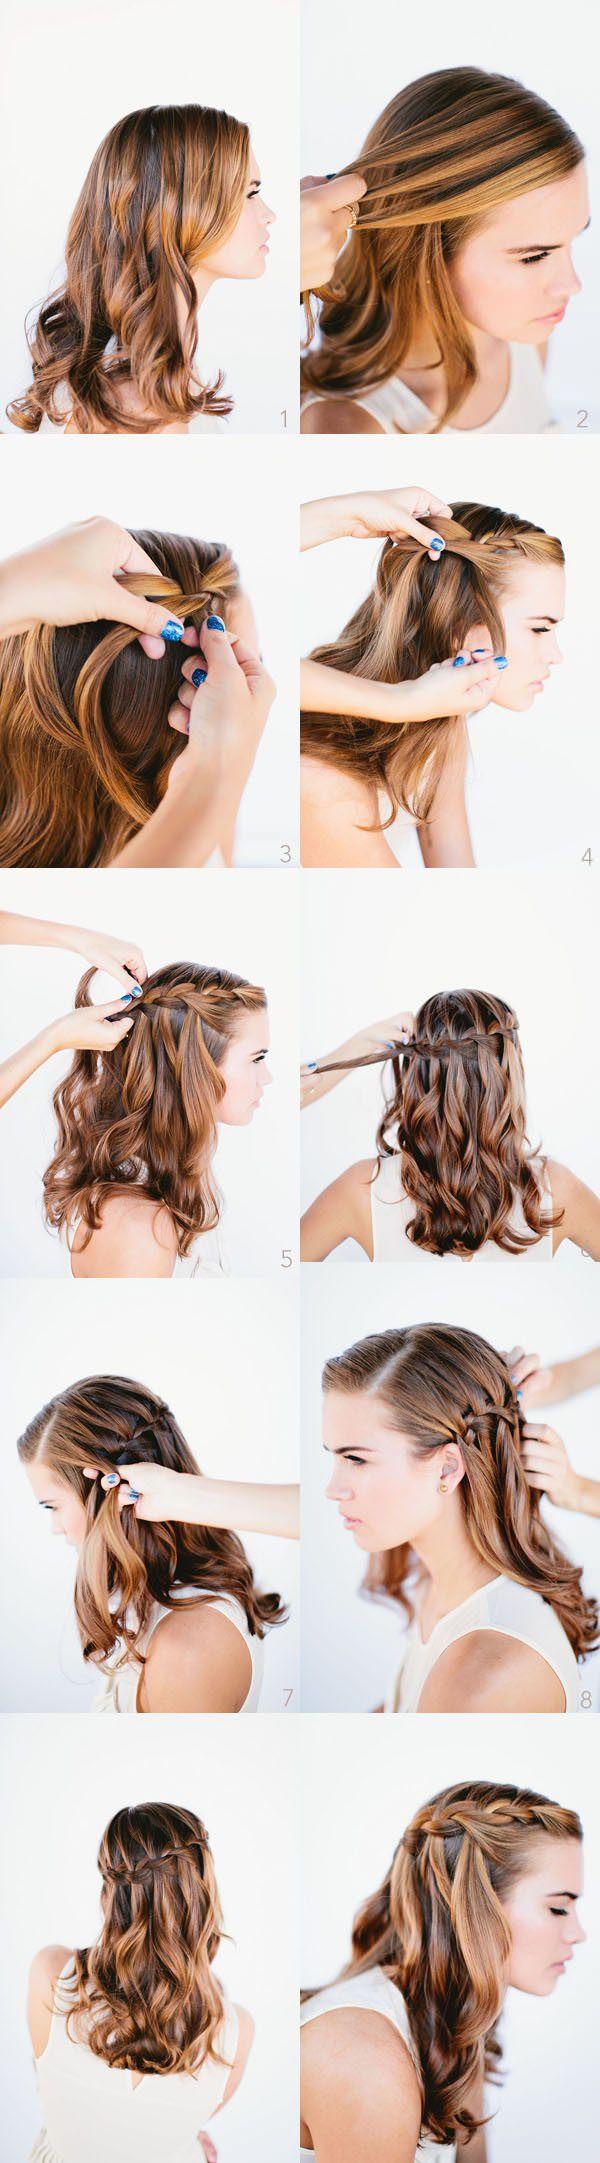 25easy-updos-for-long-hair-100416